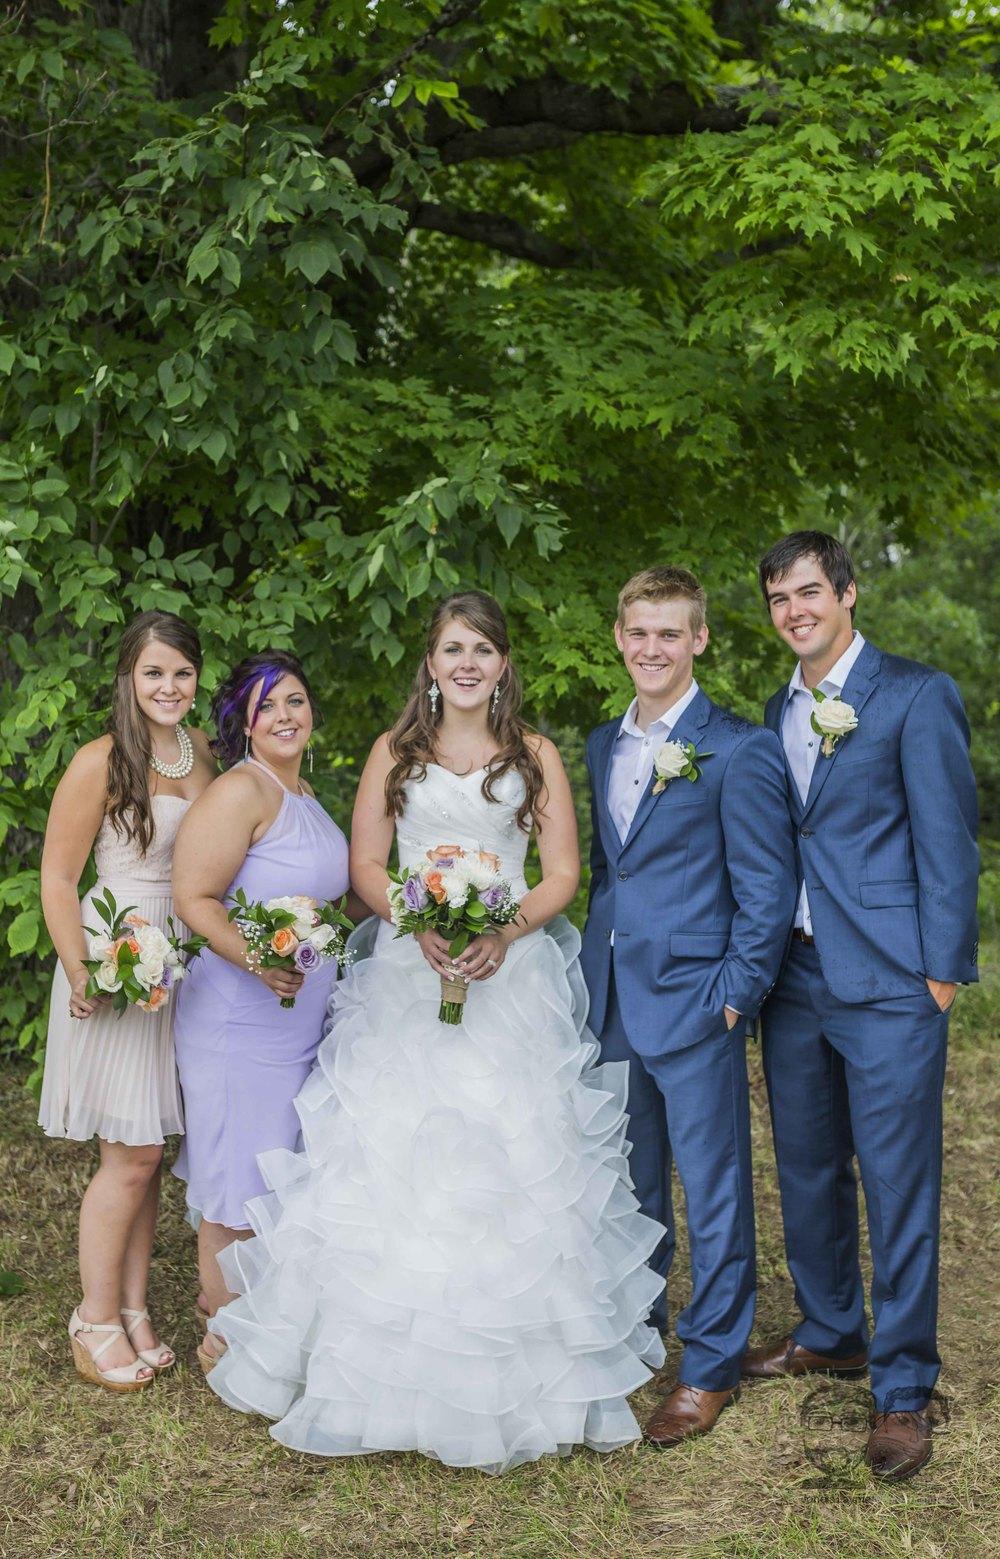 087Toronto wedding photographers and videographers-Jono & Laynie Co.jpg